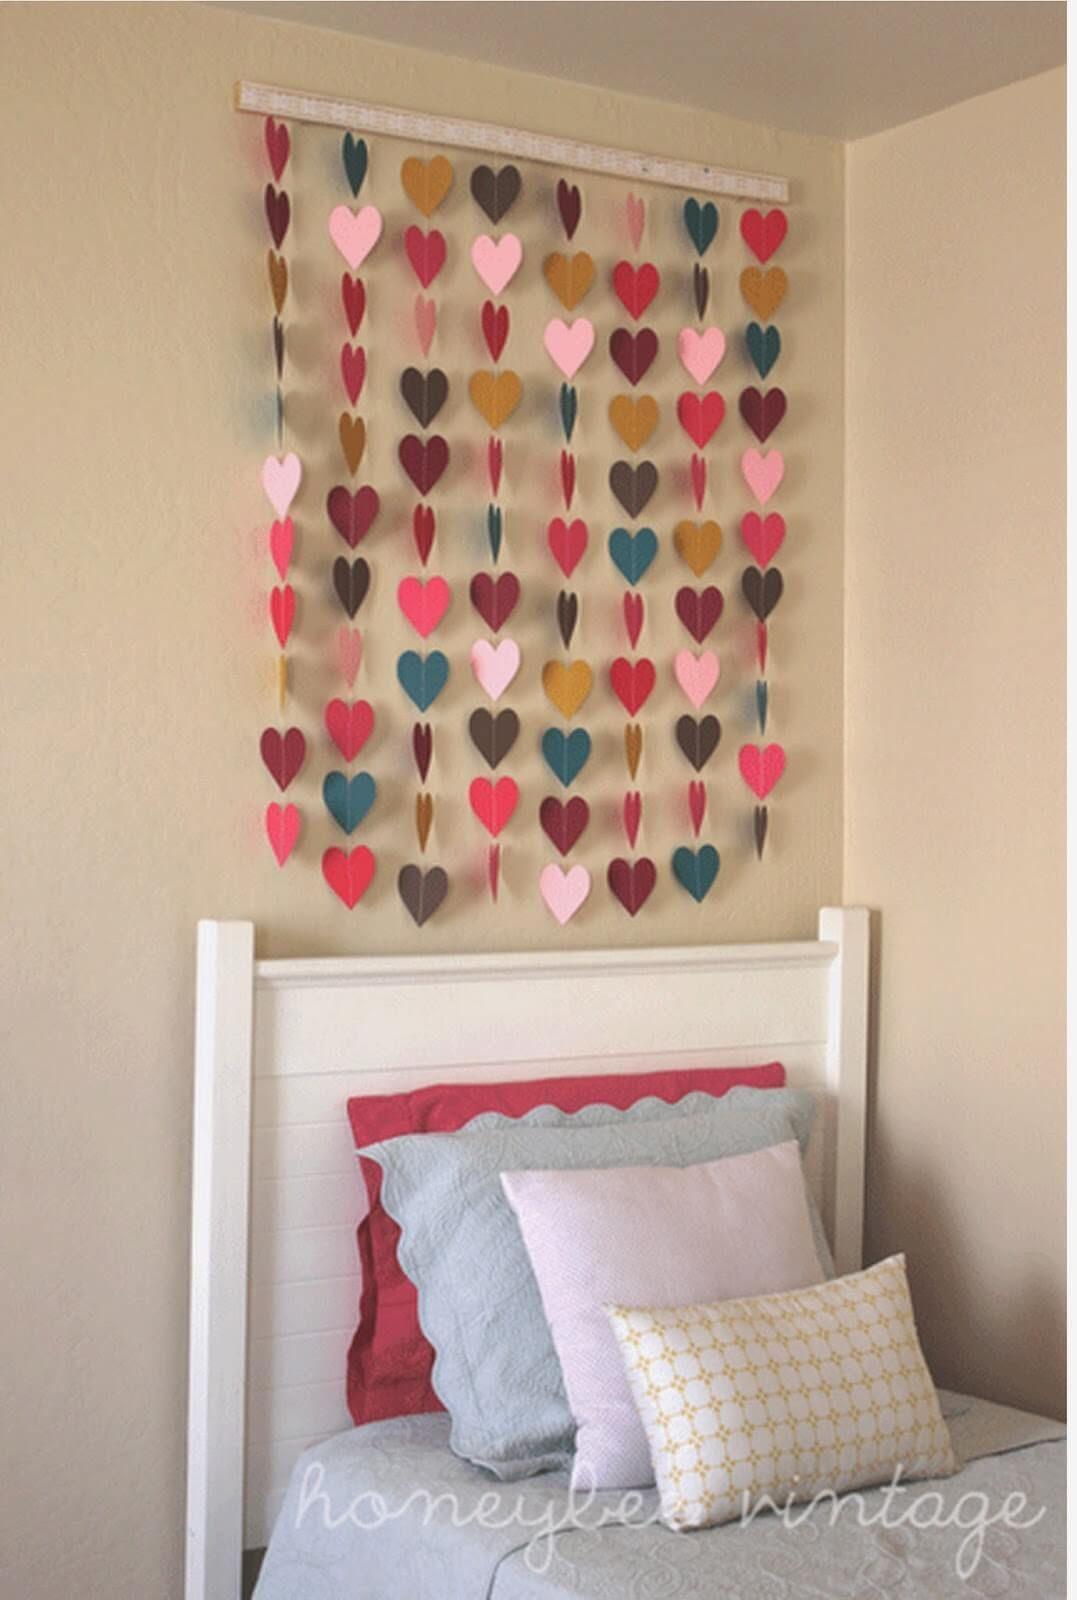 Diy Heart Cutout Wall Hanging Craft Ideas Diy Room Decor Diy